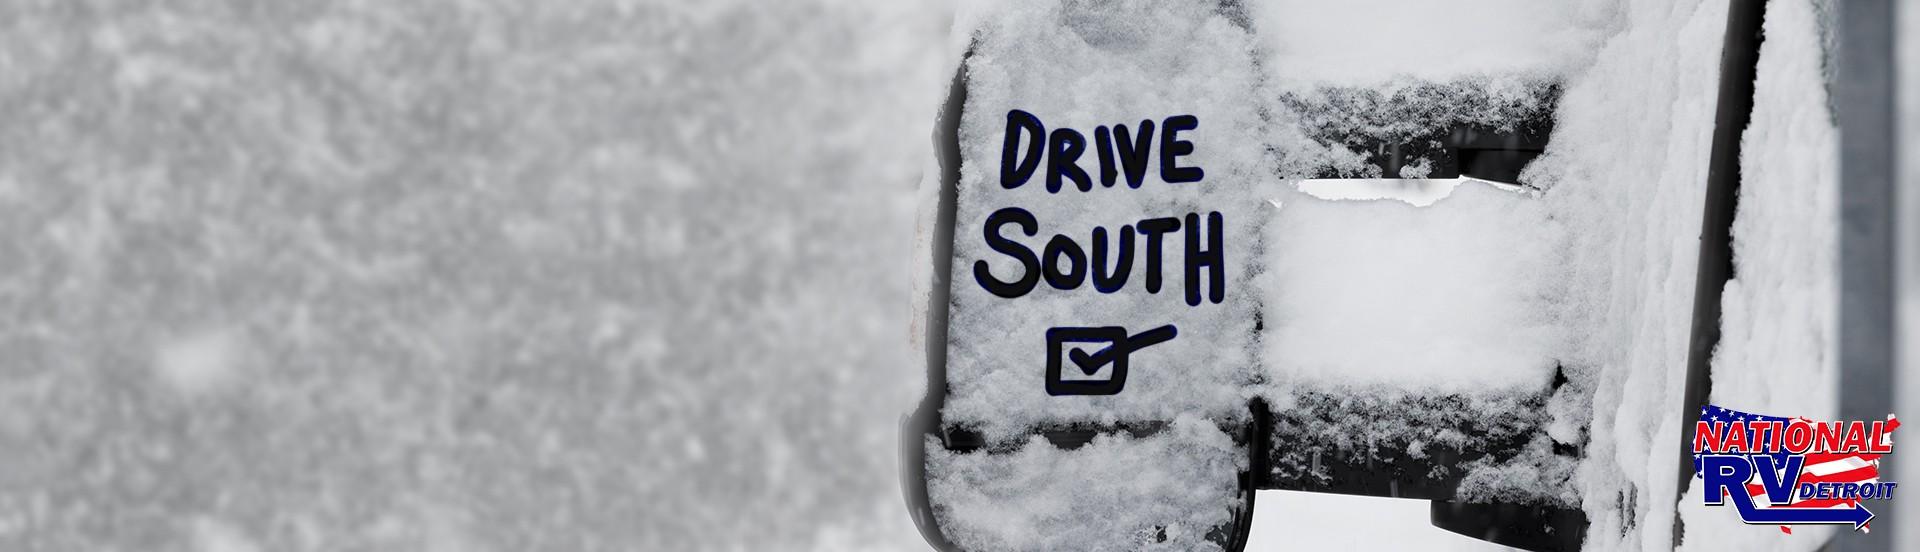 drive south check